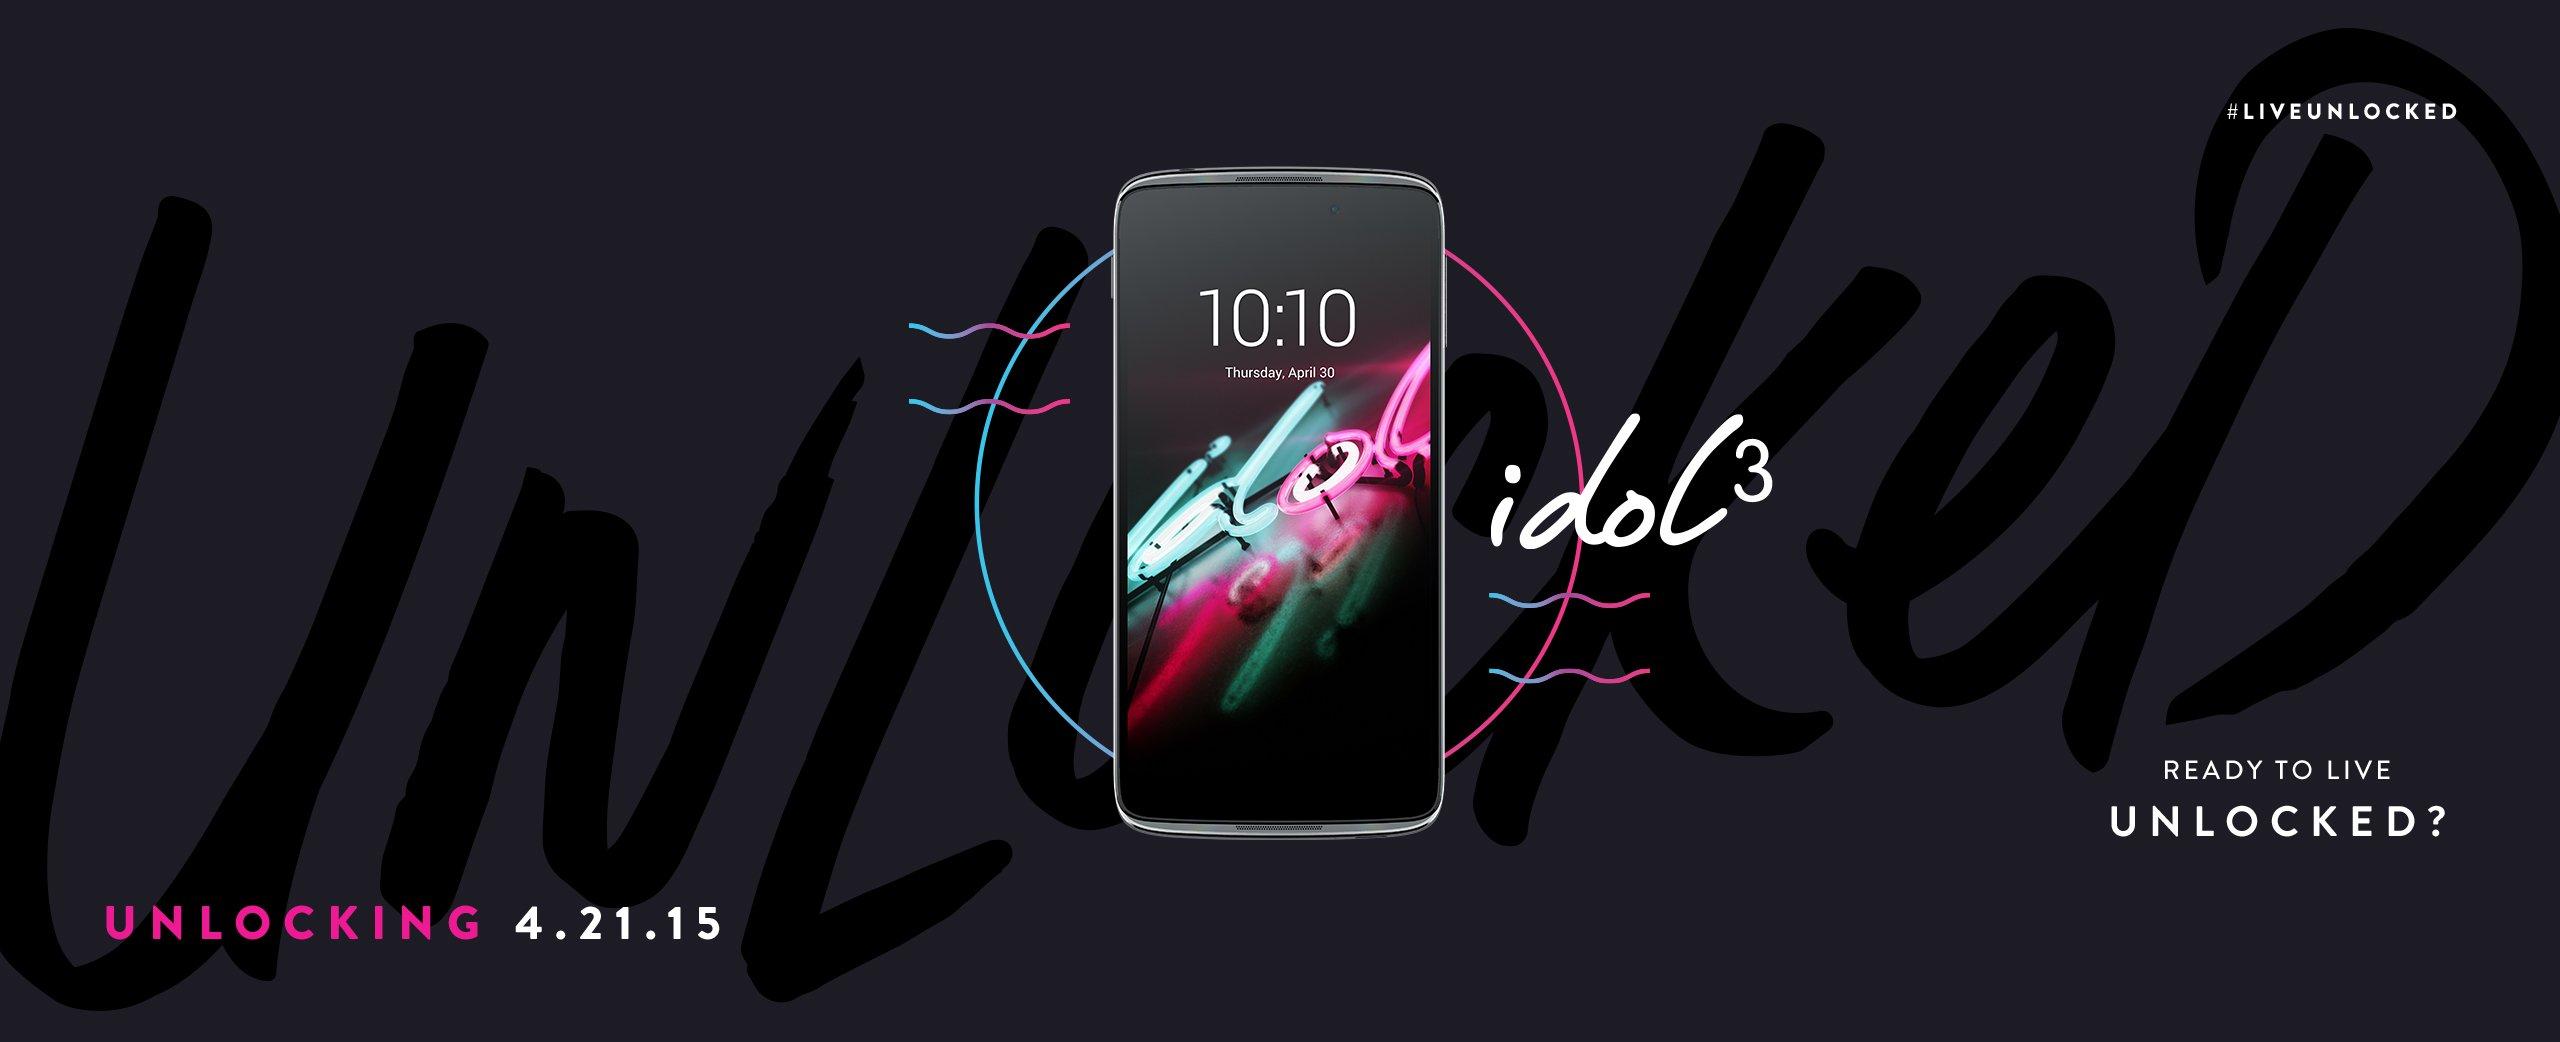 alcatel_onetouch_idol3